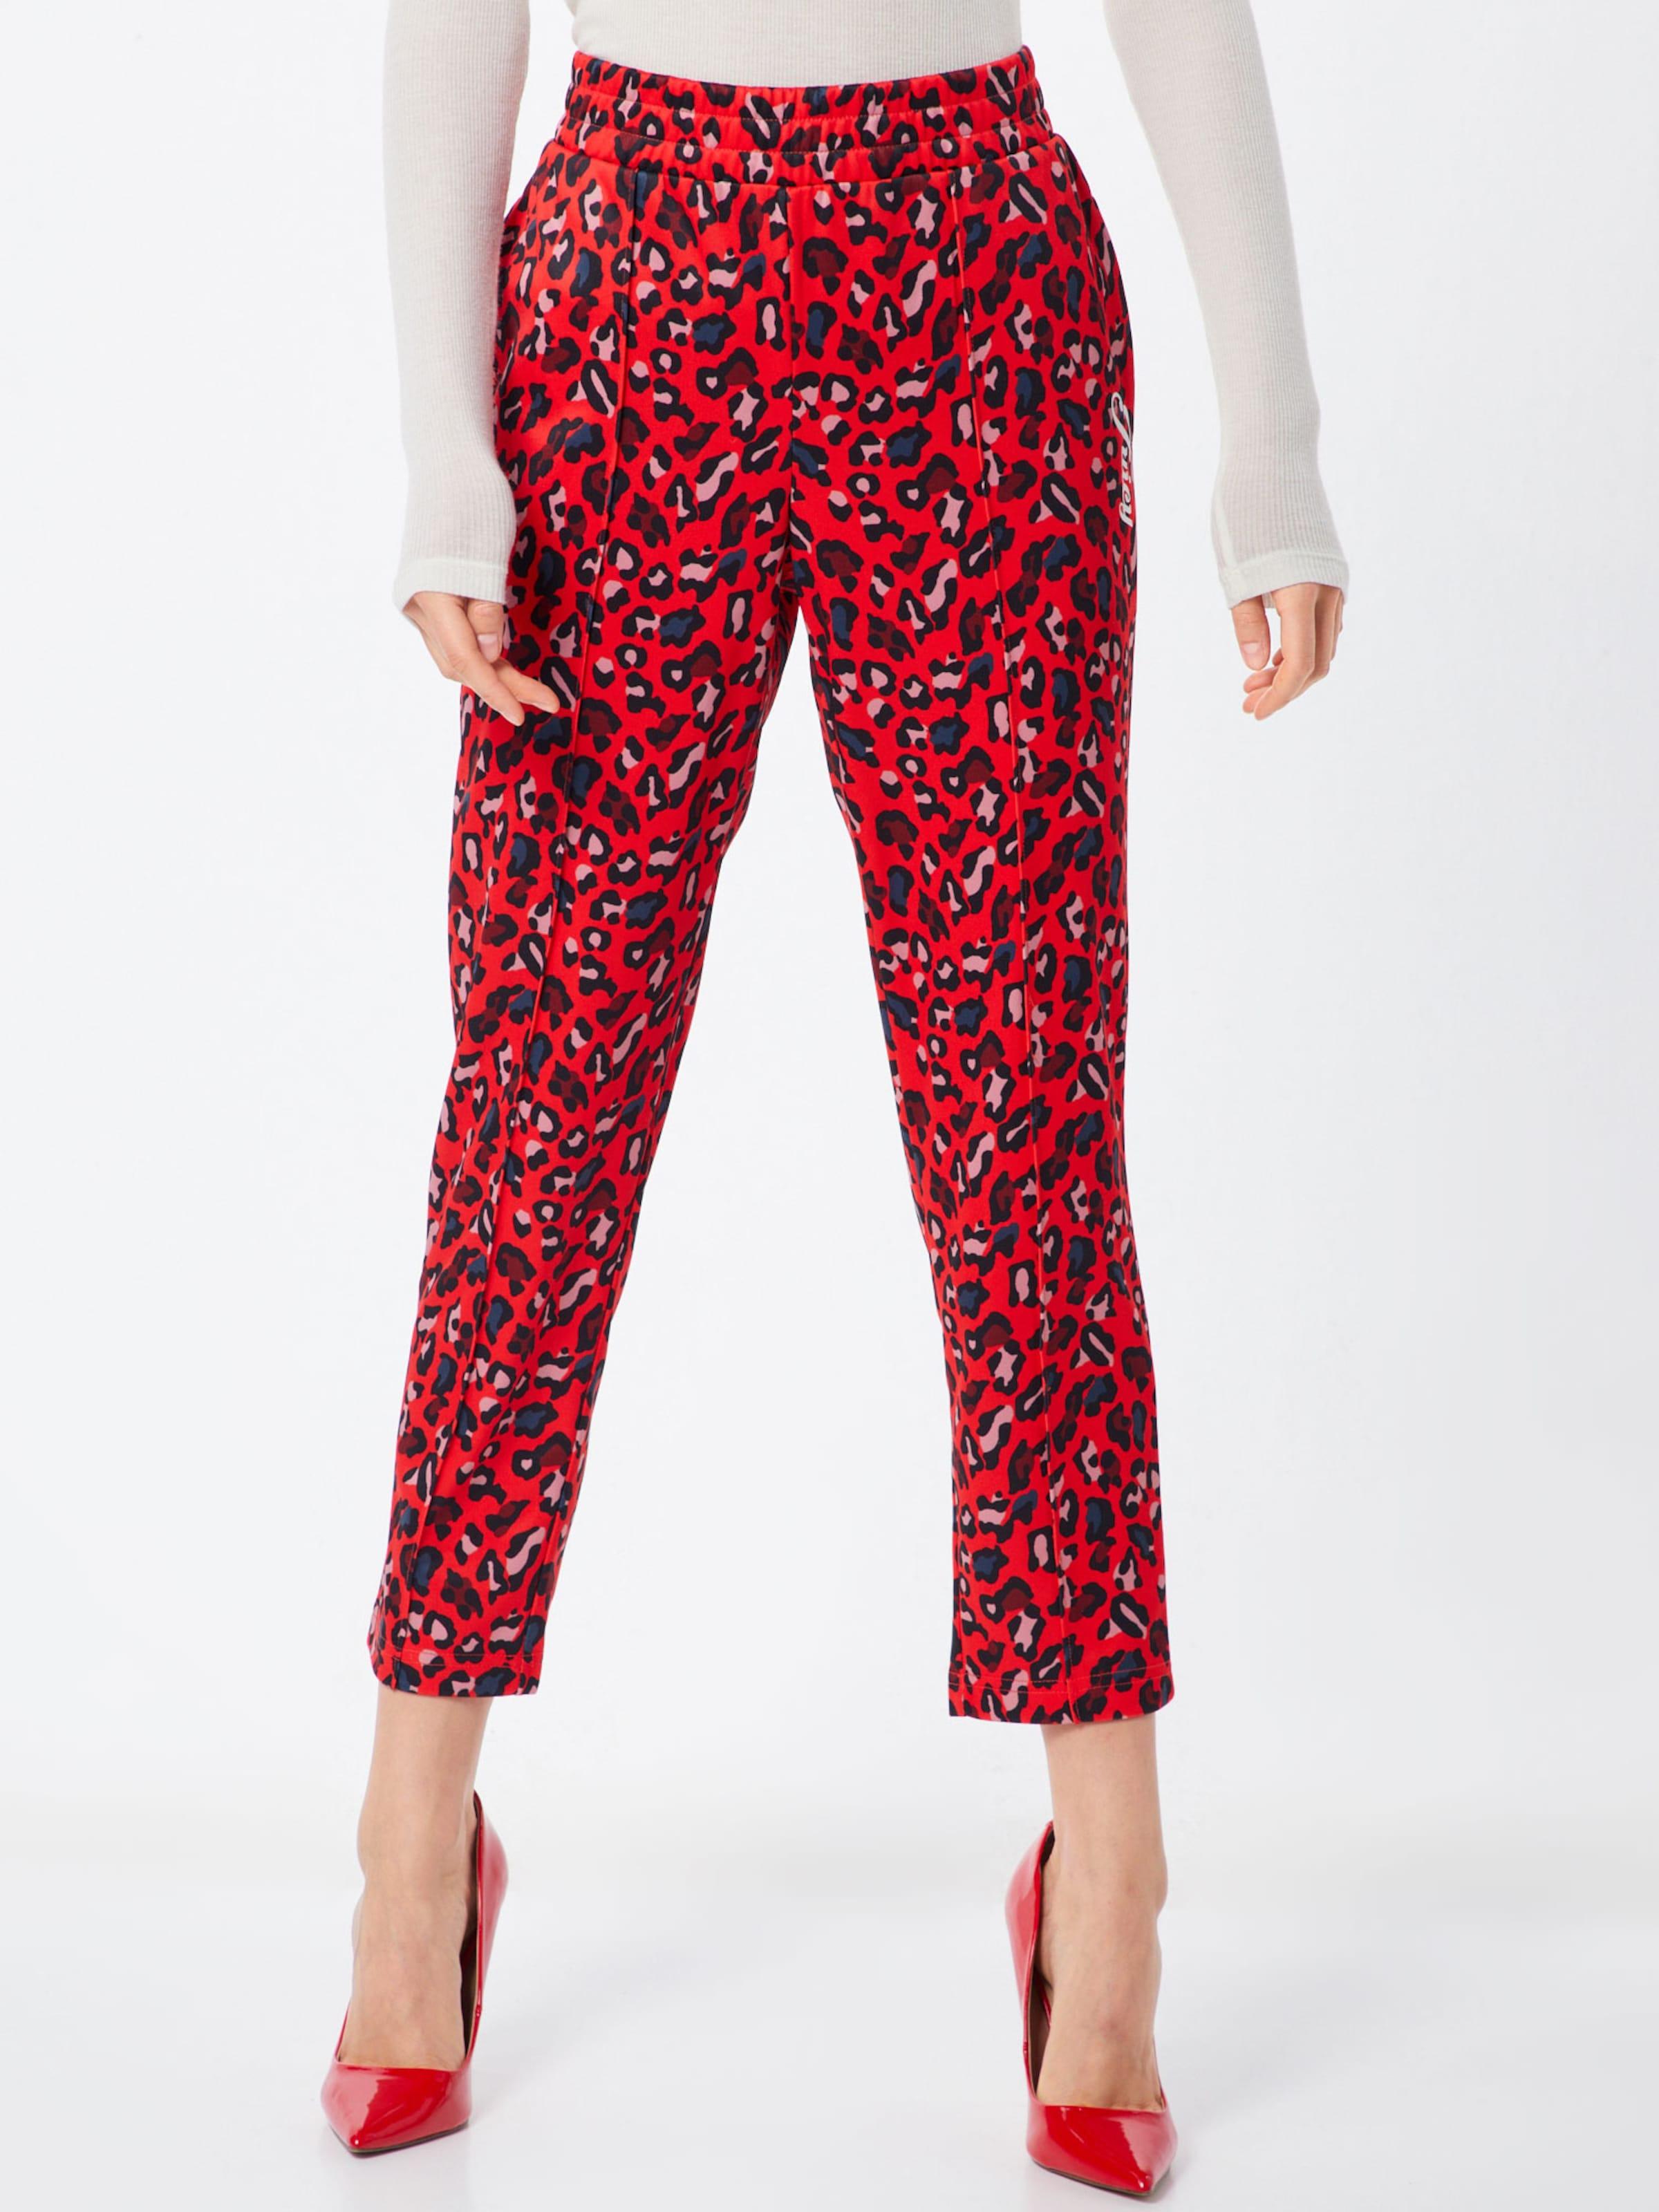 Juicy Tricot RougeNoir Pantalon Couture Printed Pant' En Track Black Label À Pince 'poly bgY6f7yv